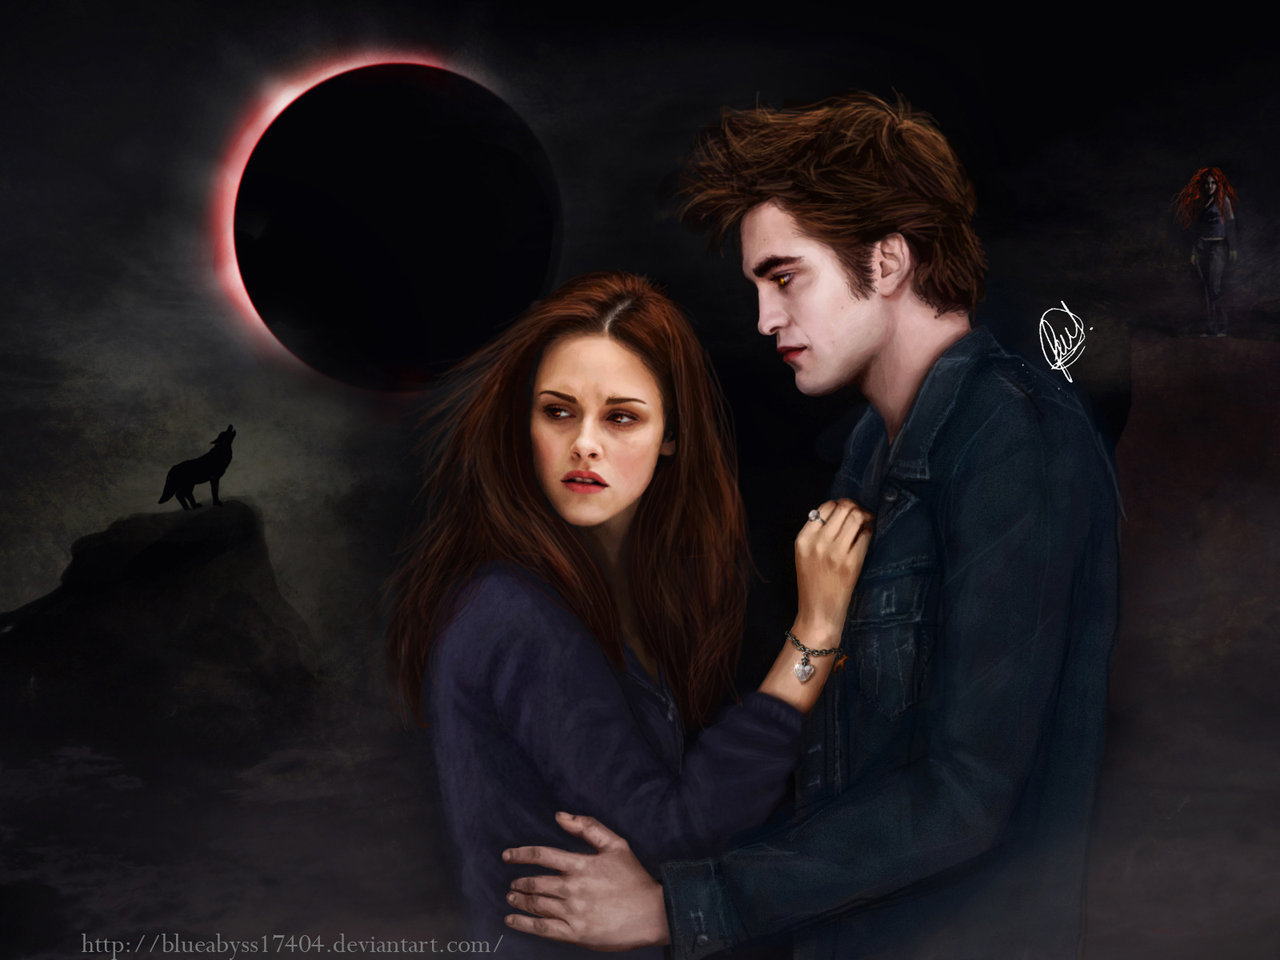 Twilight saga   Twilight Series Wallpaper 11745136 1280x960